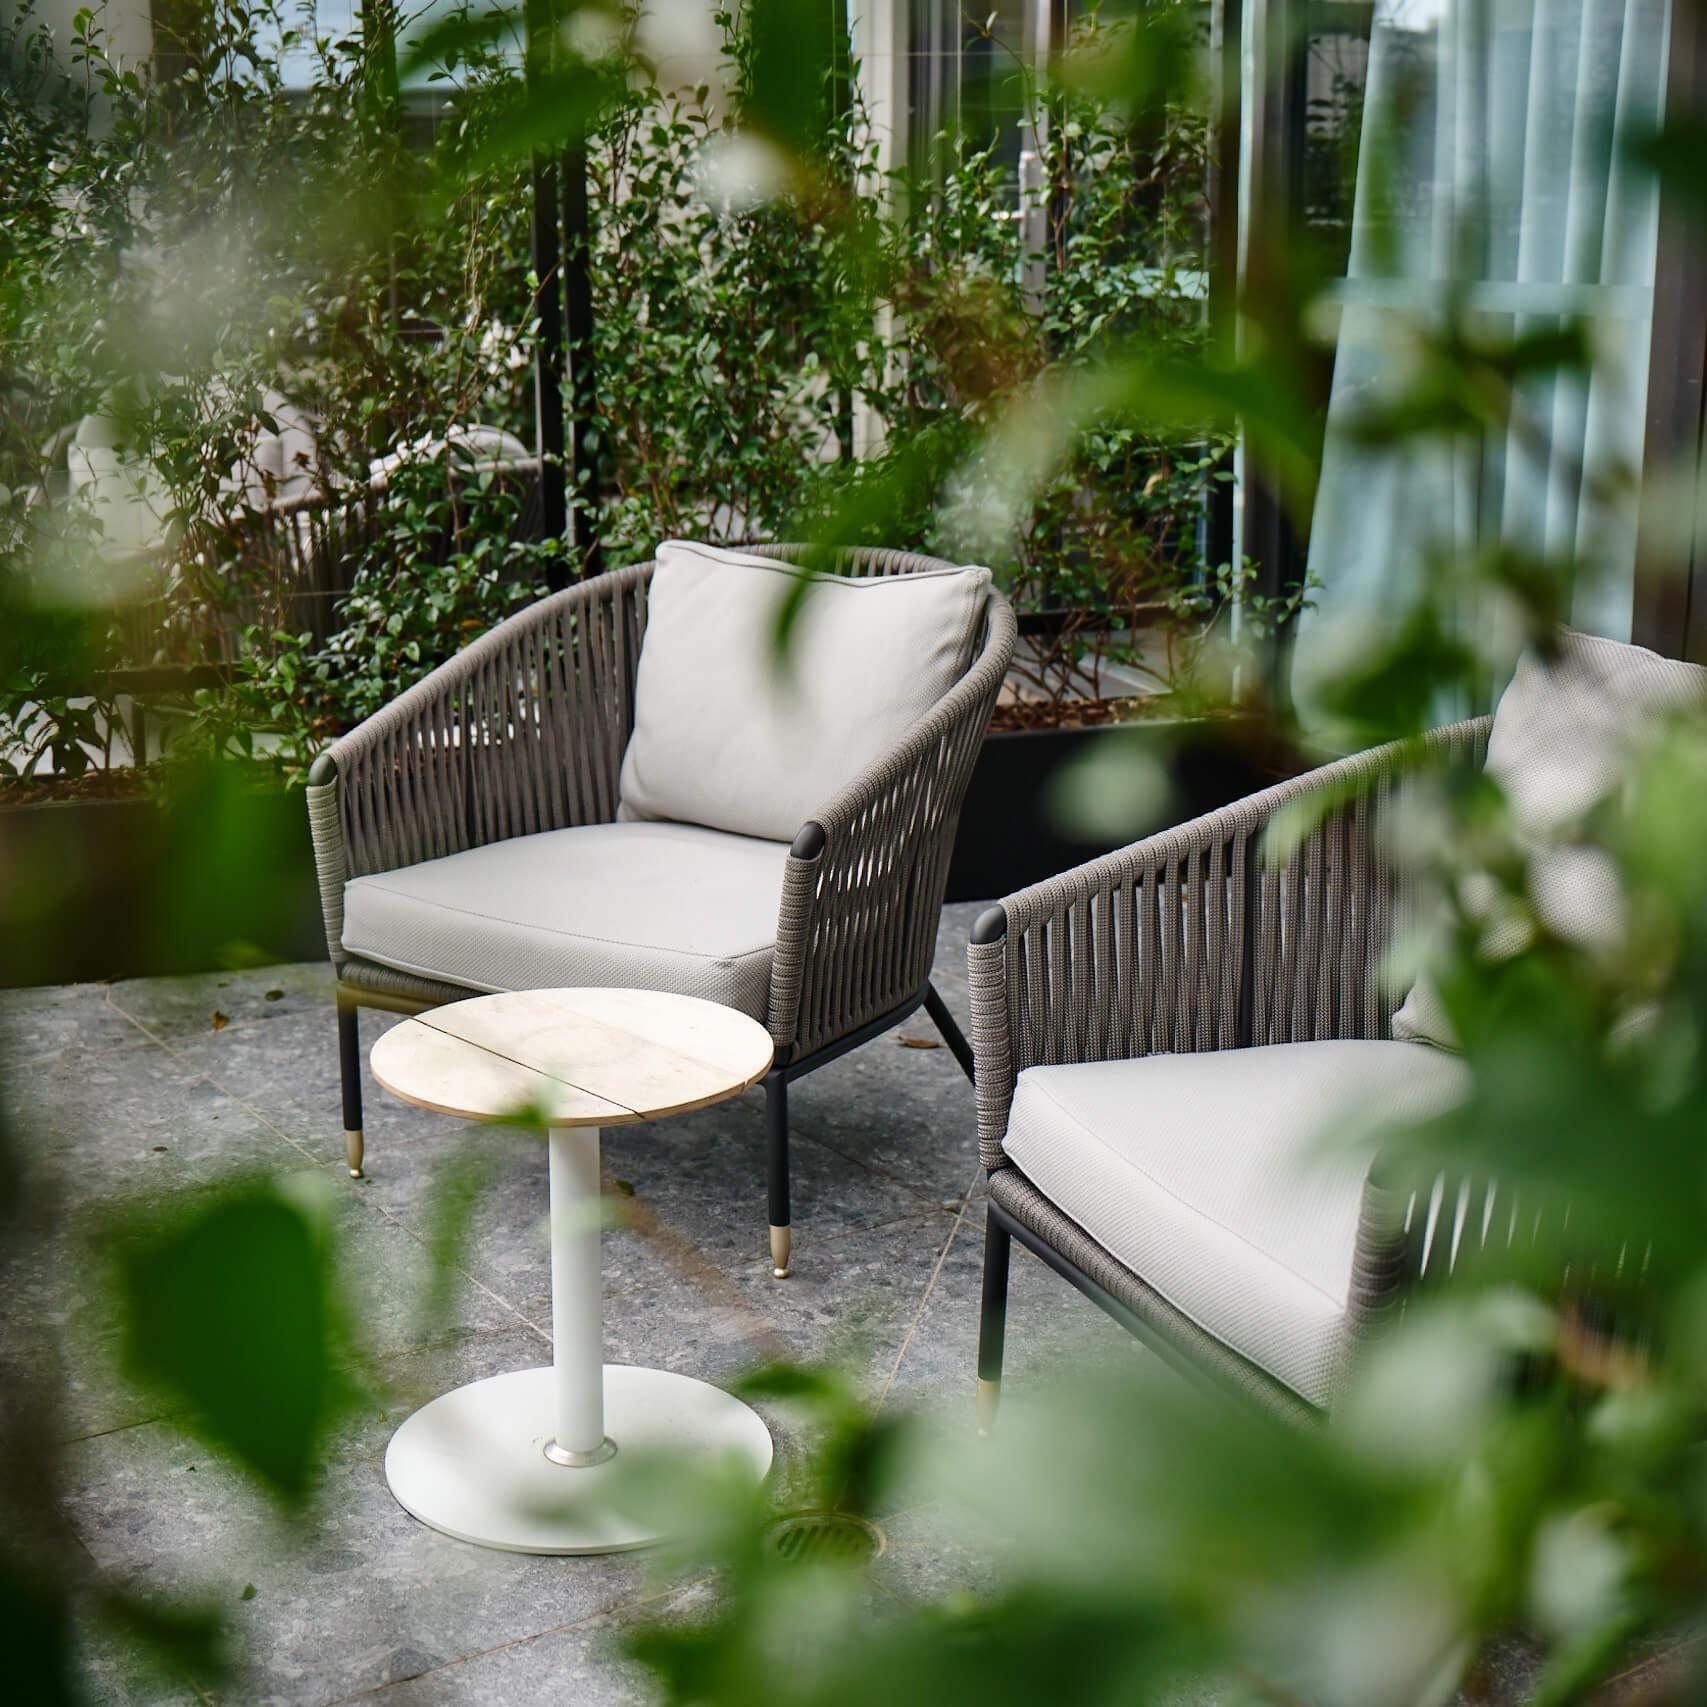 portfolio-hotels-and-apartments-qthotel-image3